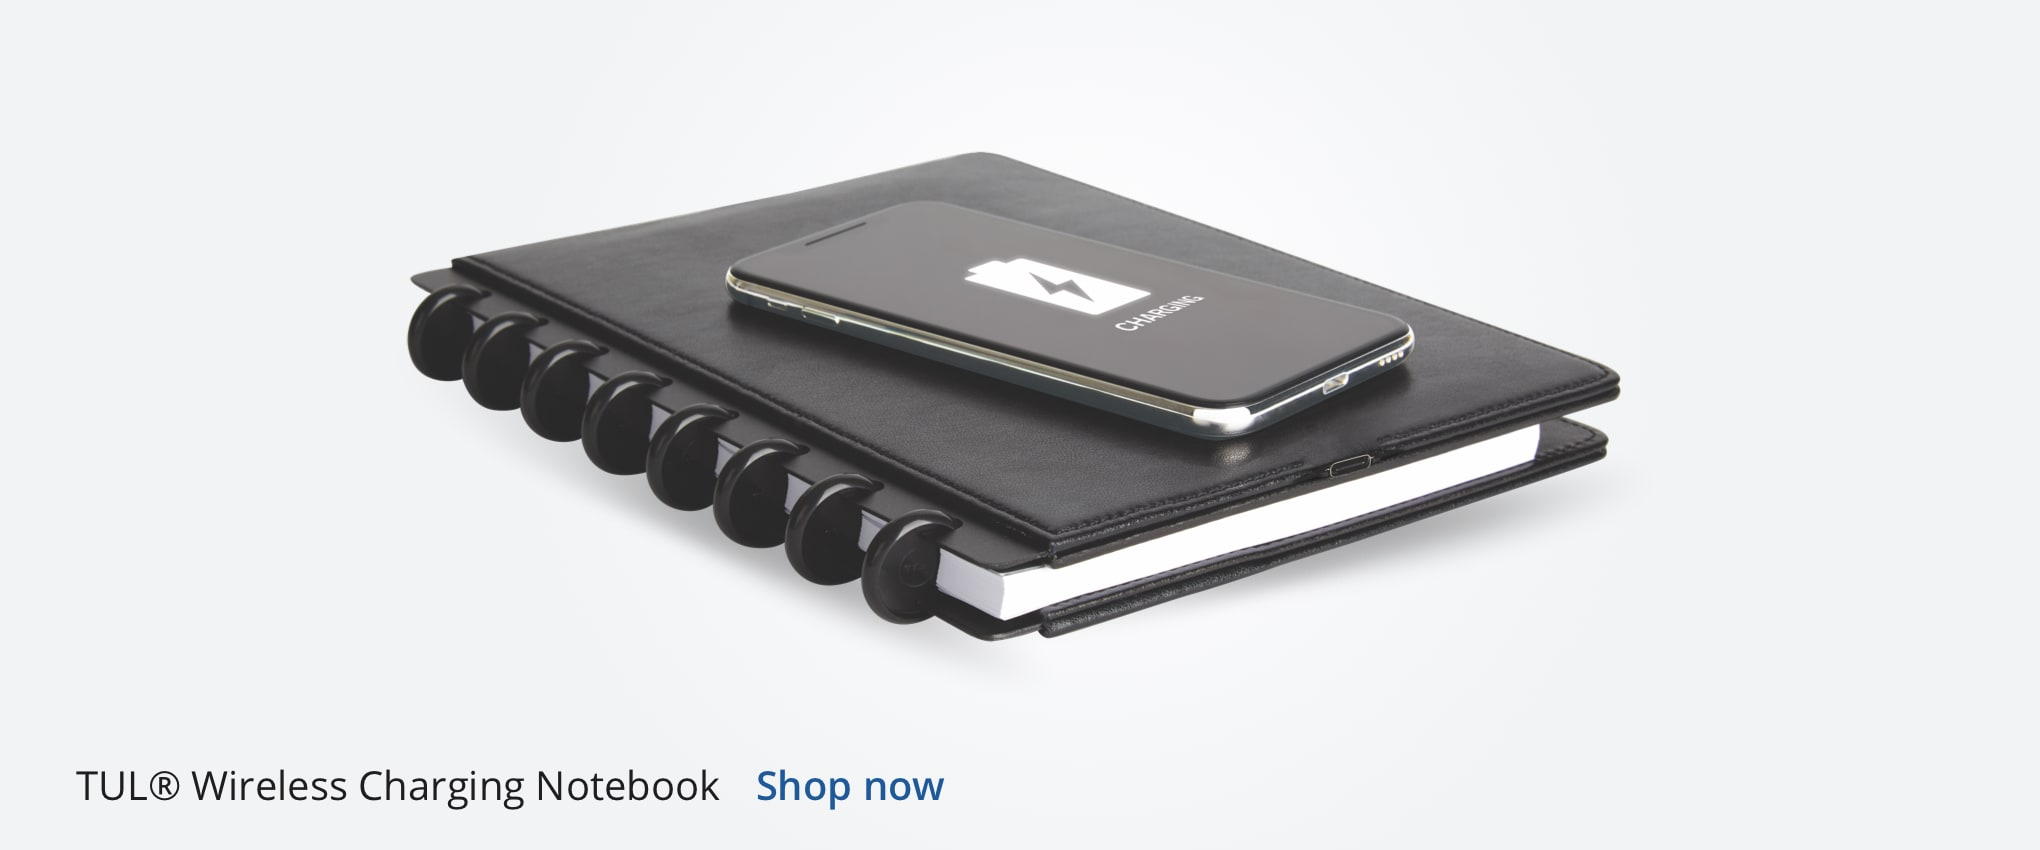 TUL Wireless Charging Notebook